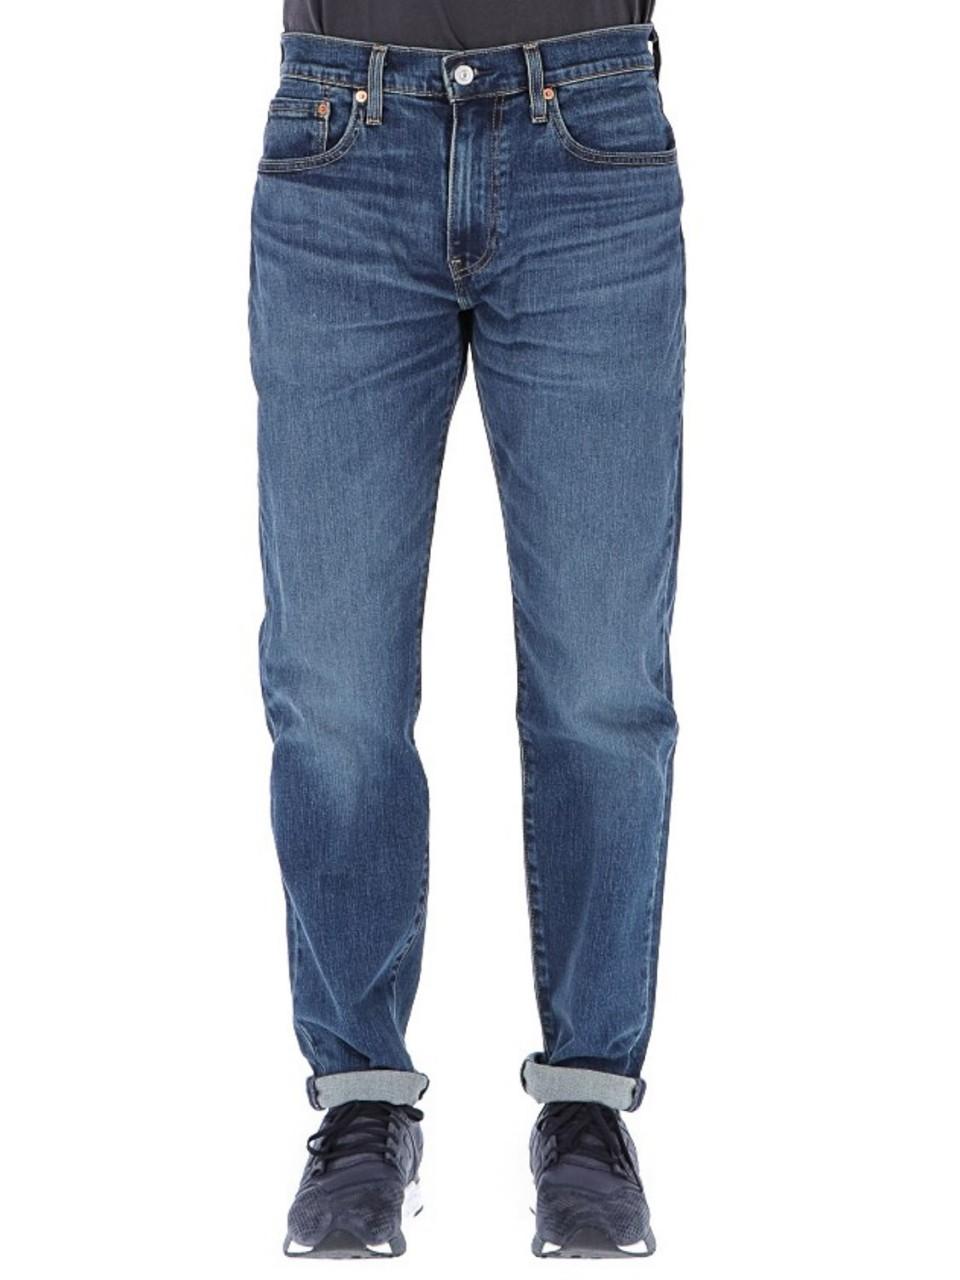 Levi's Uomo Jeans Levi's Uomom 502 Geep Adapt All Season L 32 5070191I